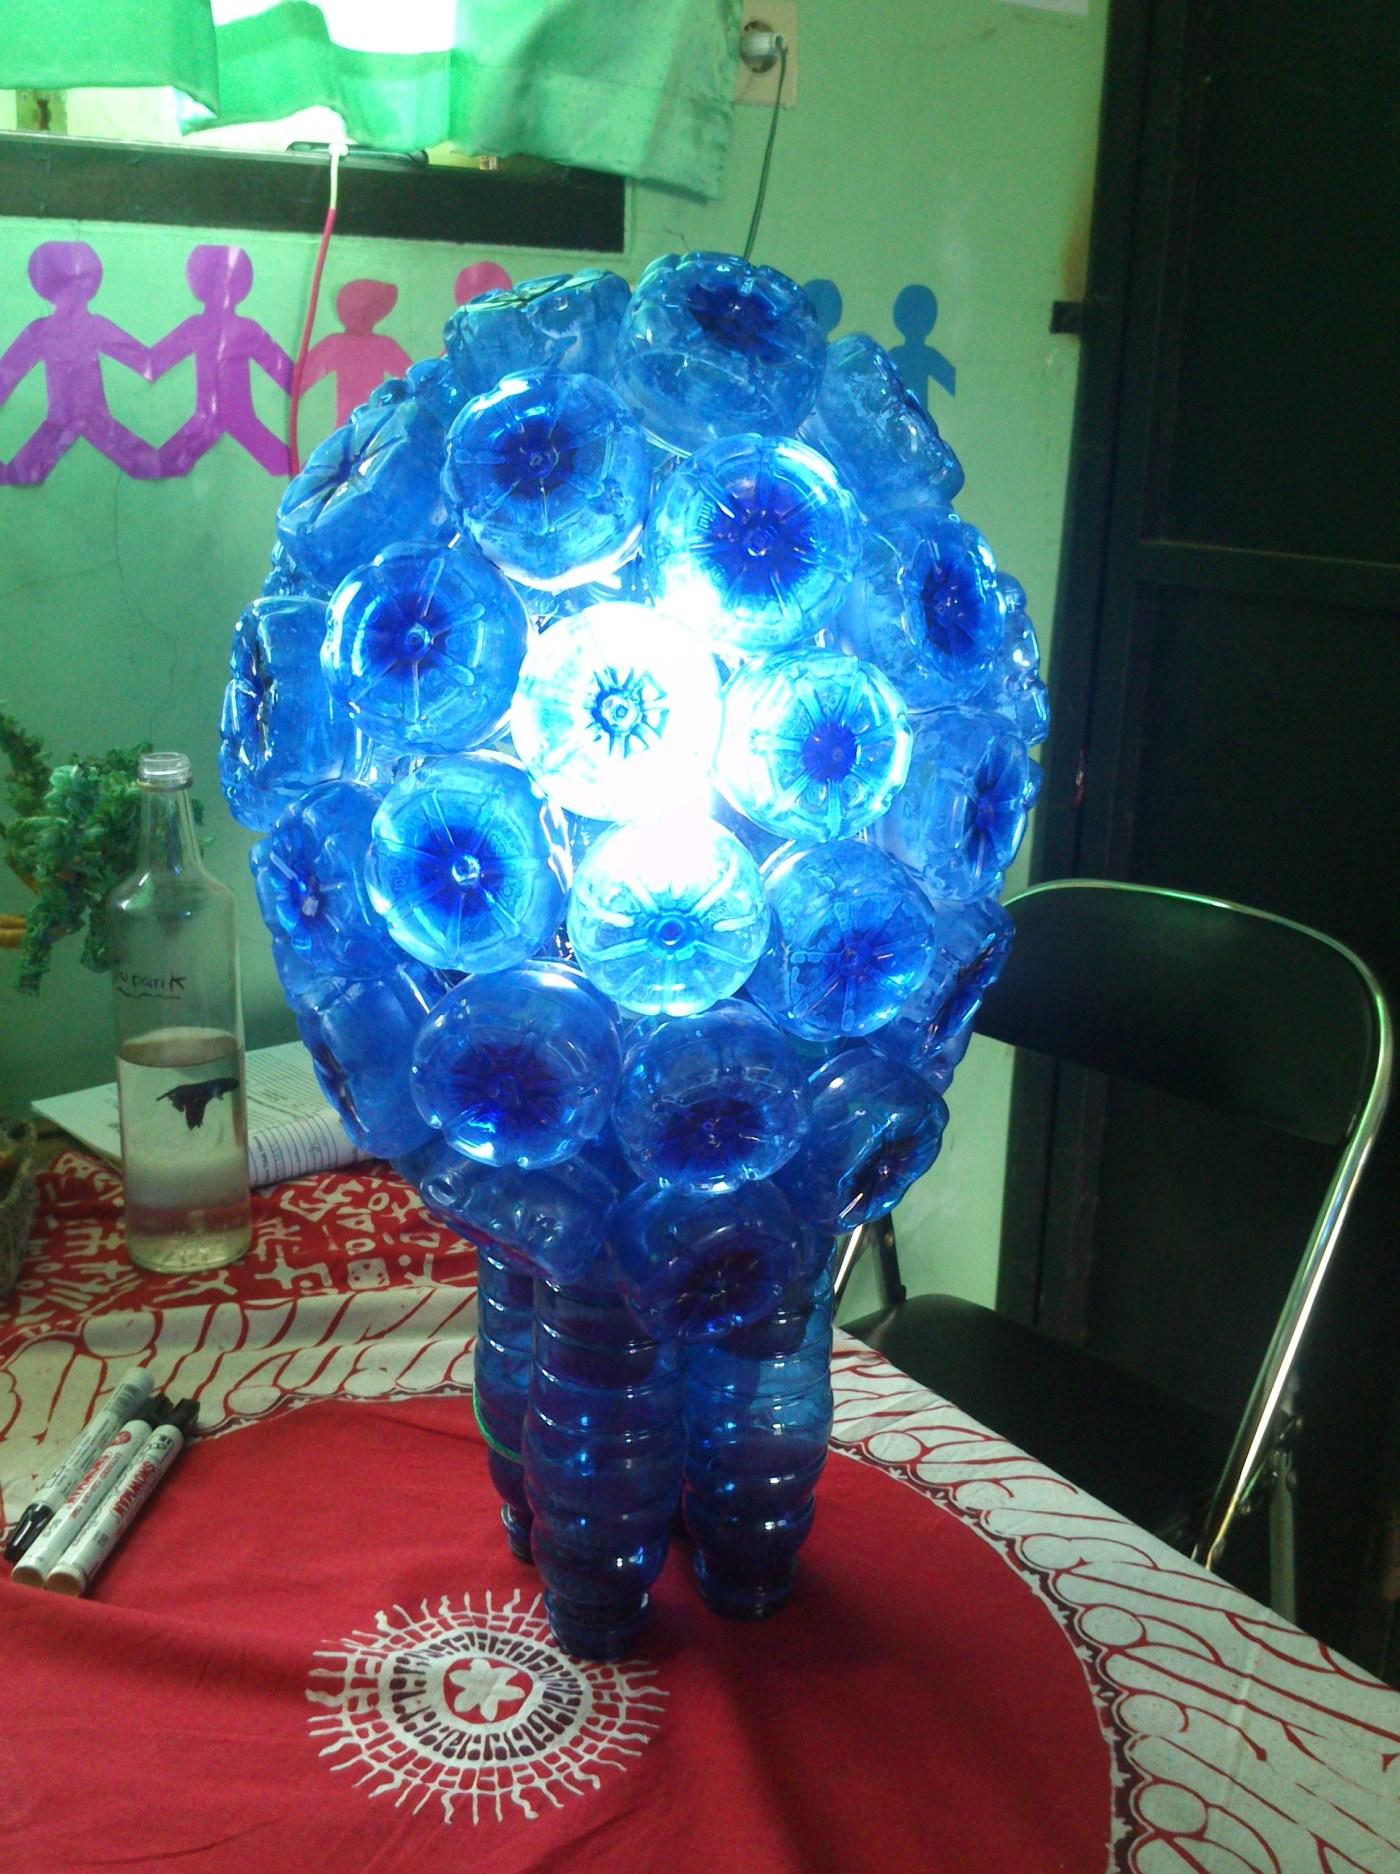 Lampu Hias Dari Botol Aqua : lampu, botol, Membuat, Lampu, Botol, Mizone